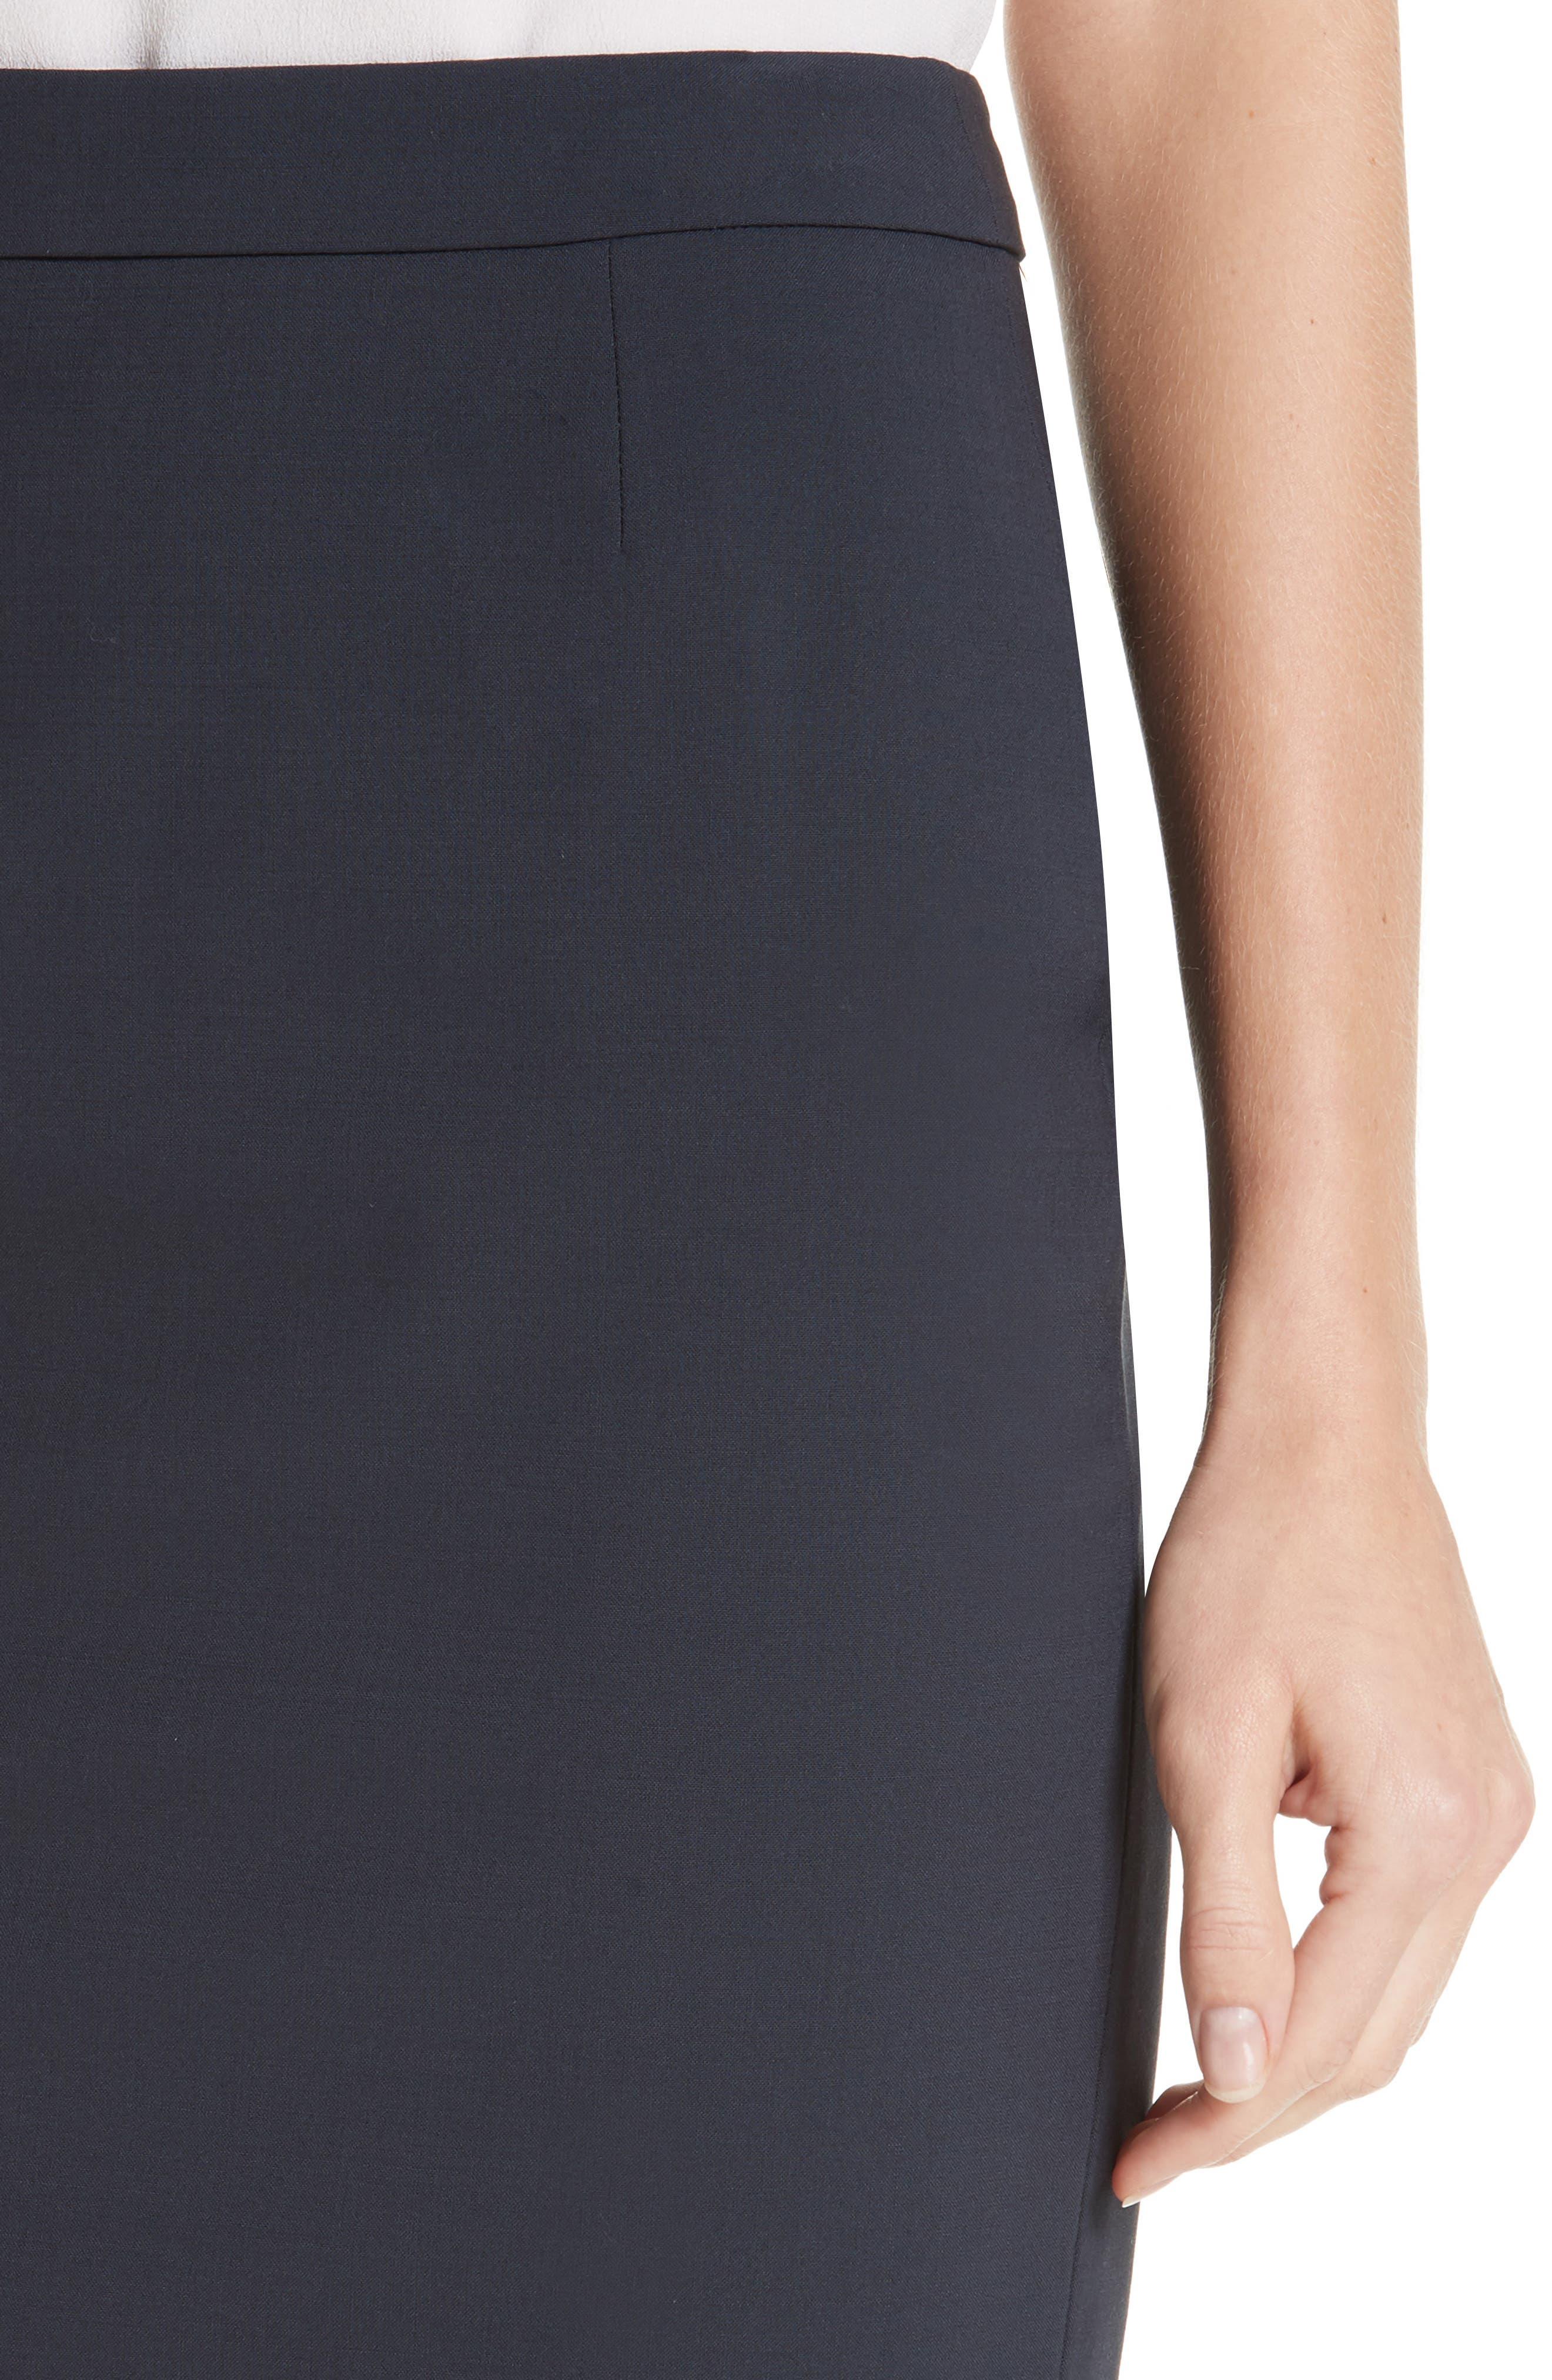 BOSS, Vilea Tropical Stretch Wool Pencil Skirt, Alternate thumbnail 4, color, NAVY